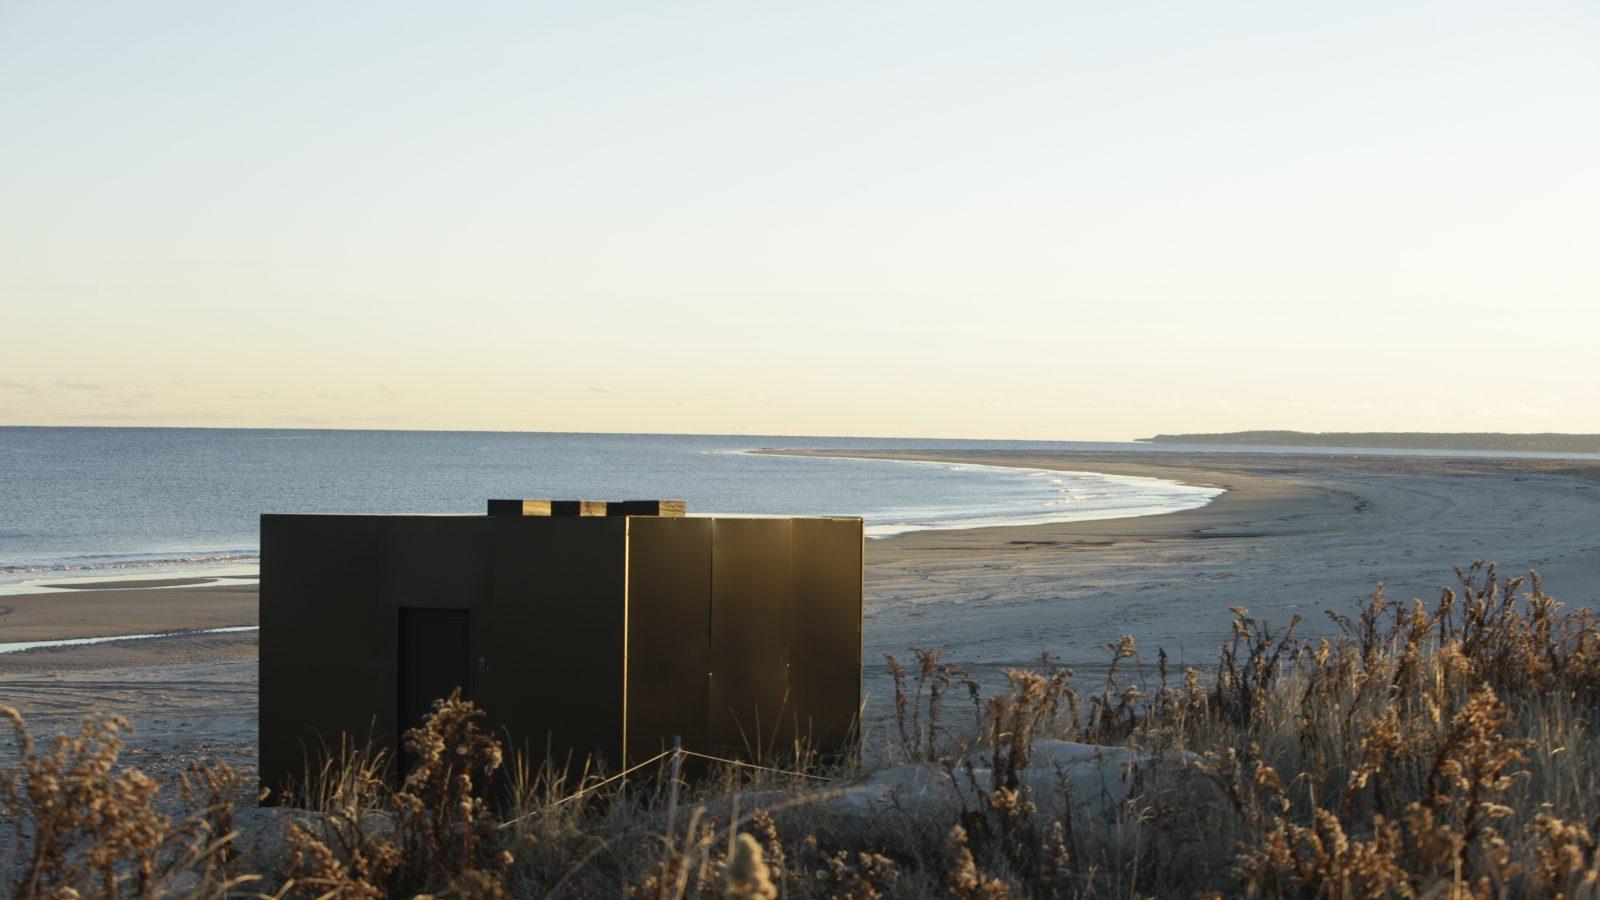 Small black rectangular building on a beach